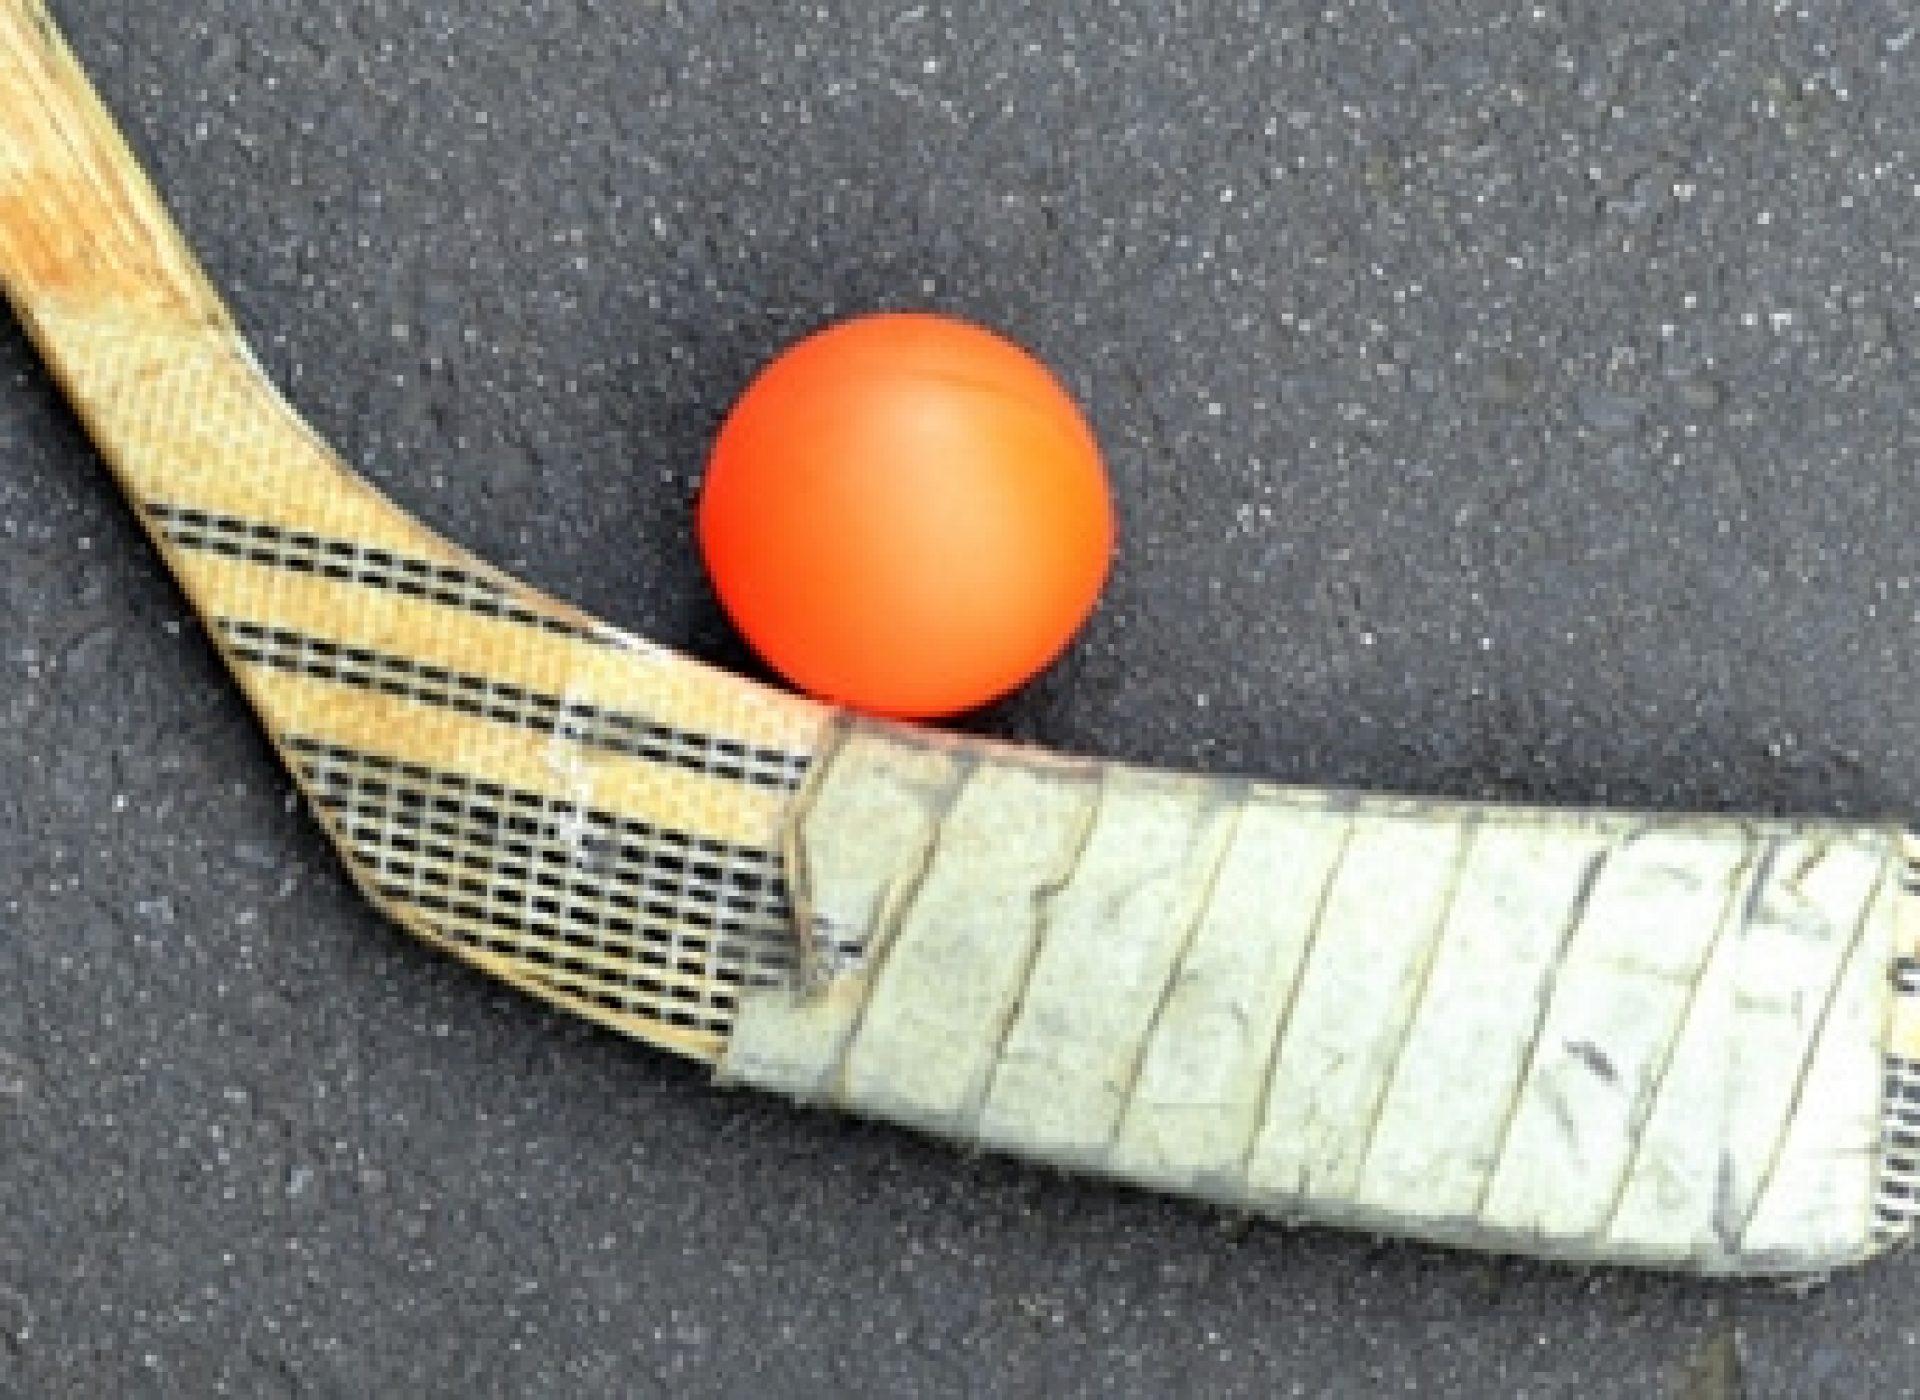 ballhockey